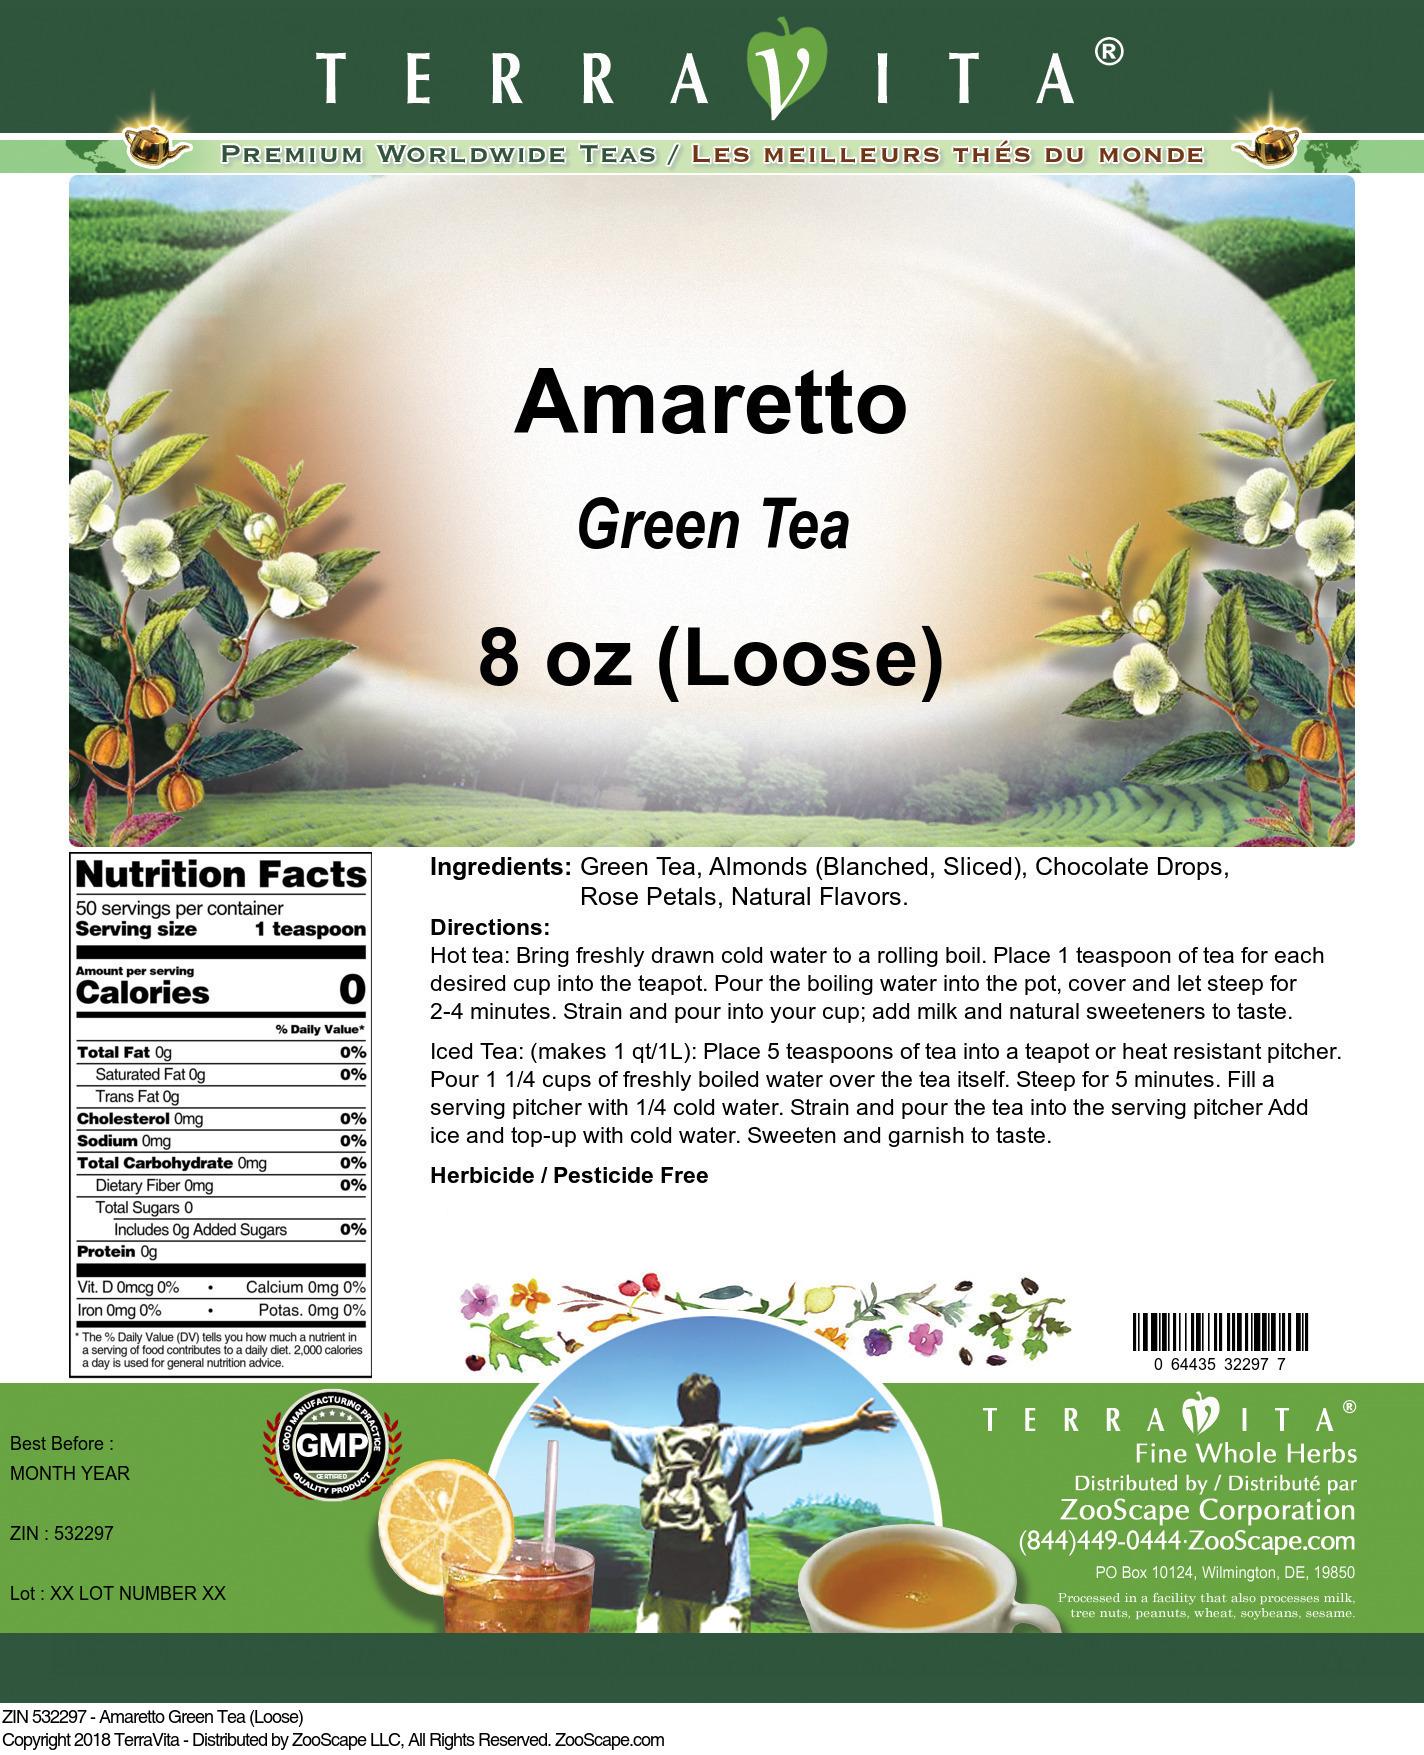 Amaretto Green Tea (Loose)